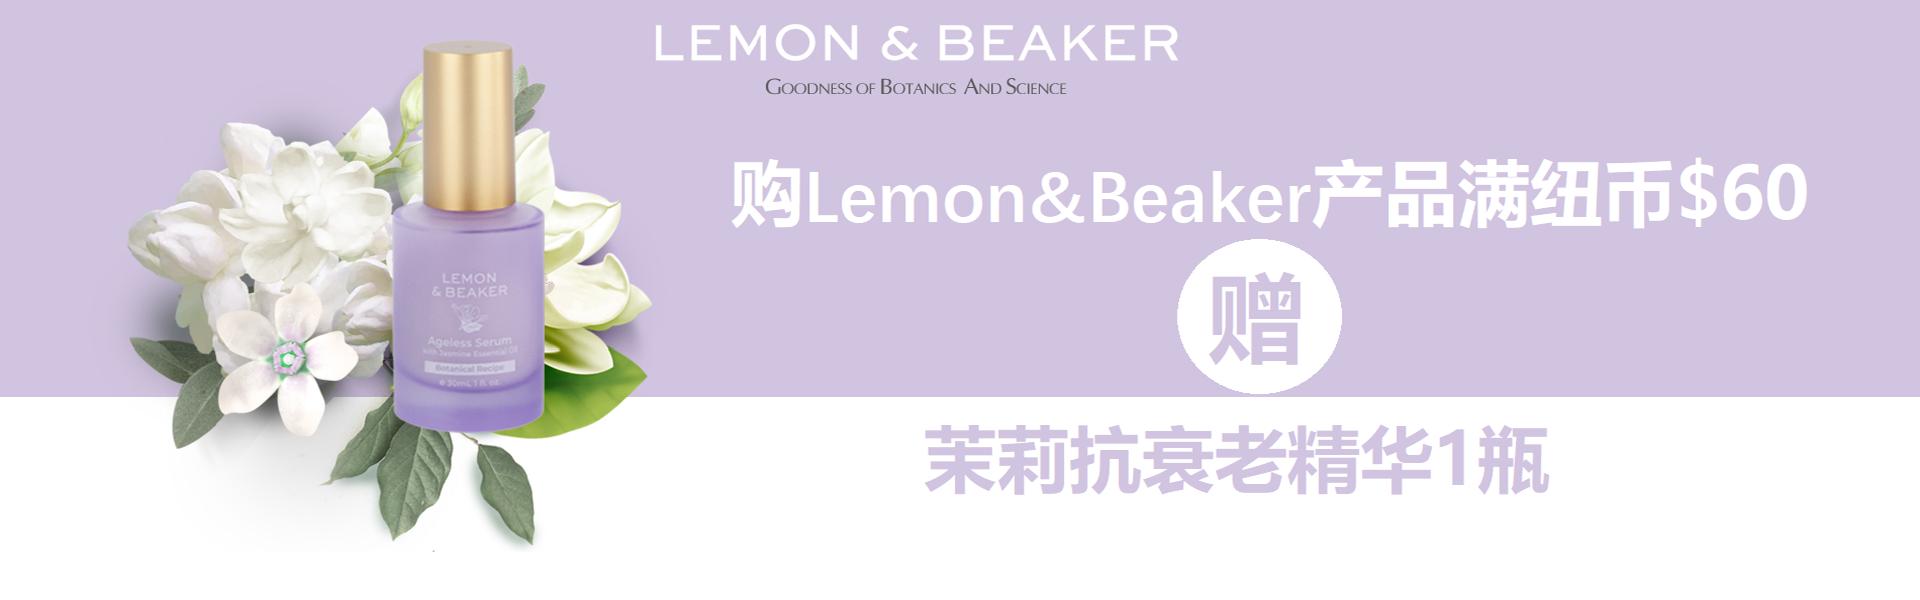 Lemon&Beaker产品满60纽币赠抗衰老精华1瓶